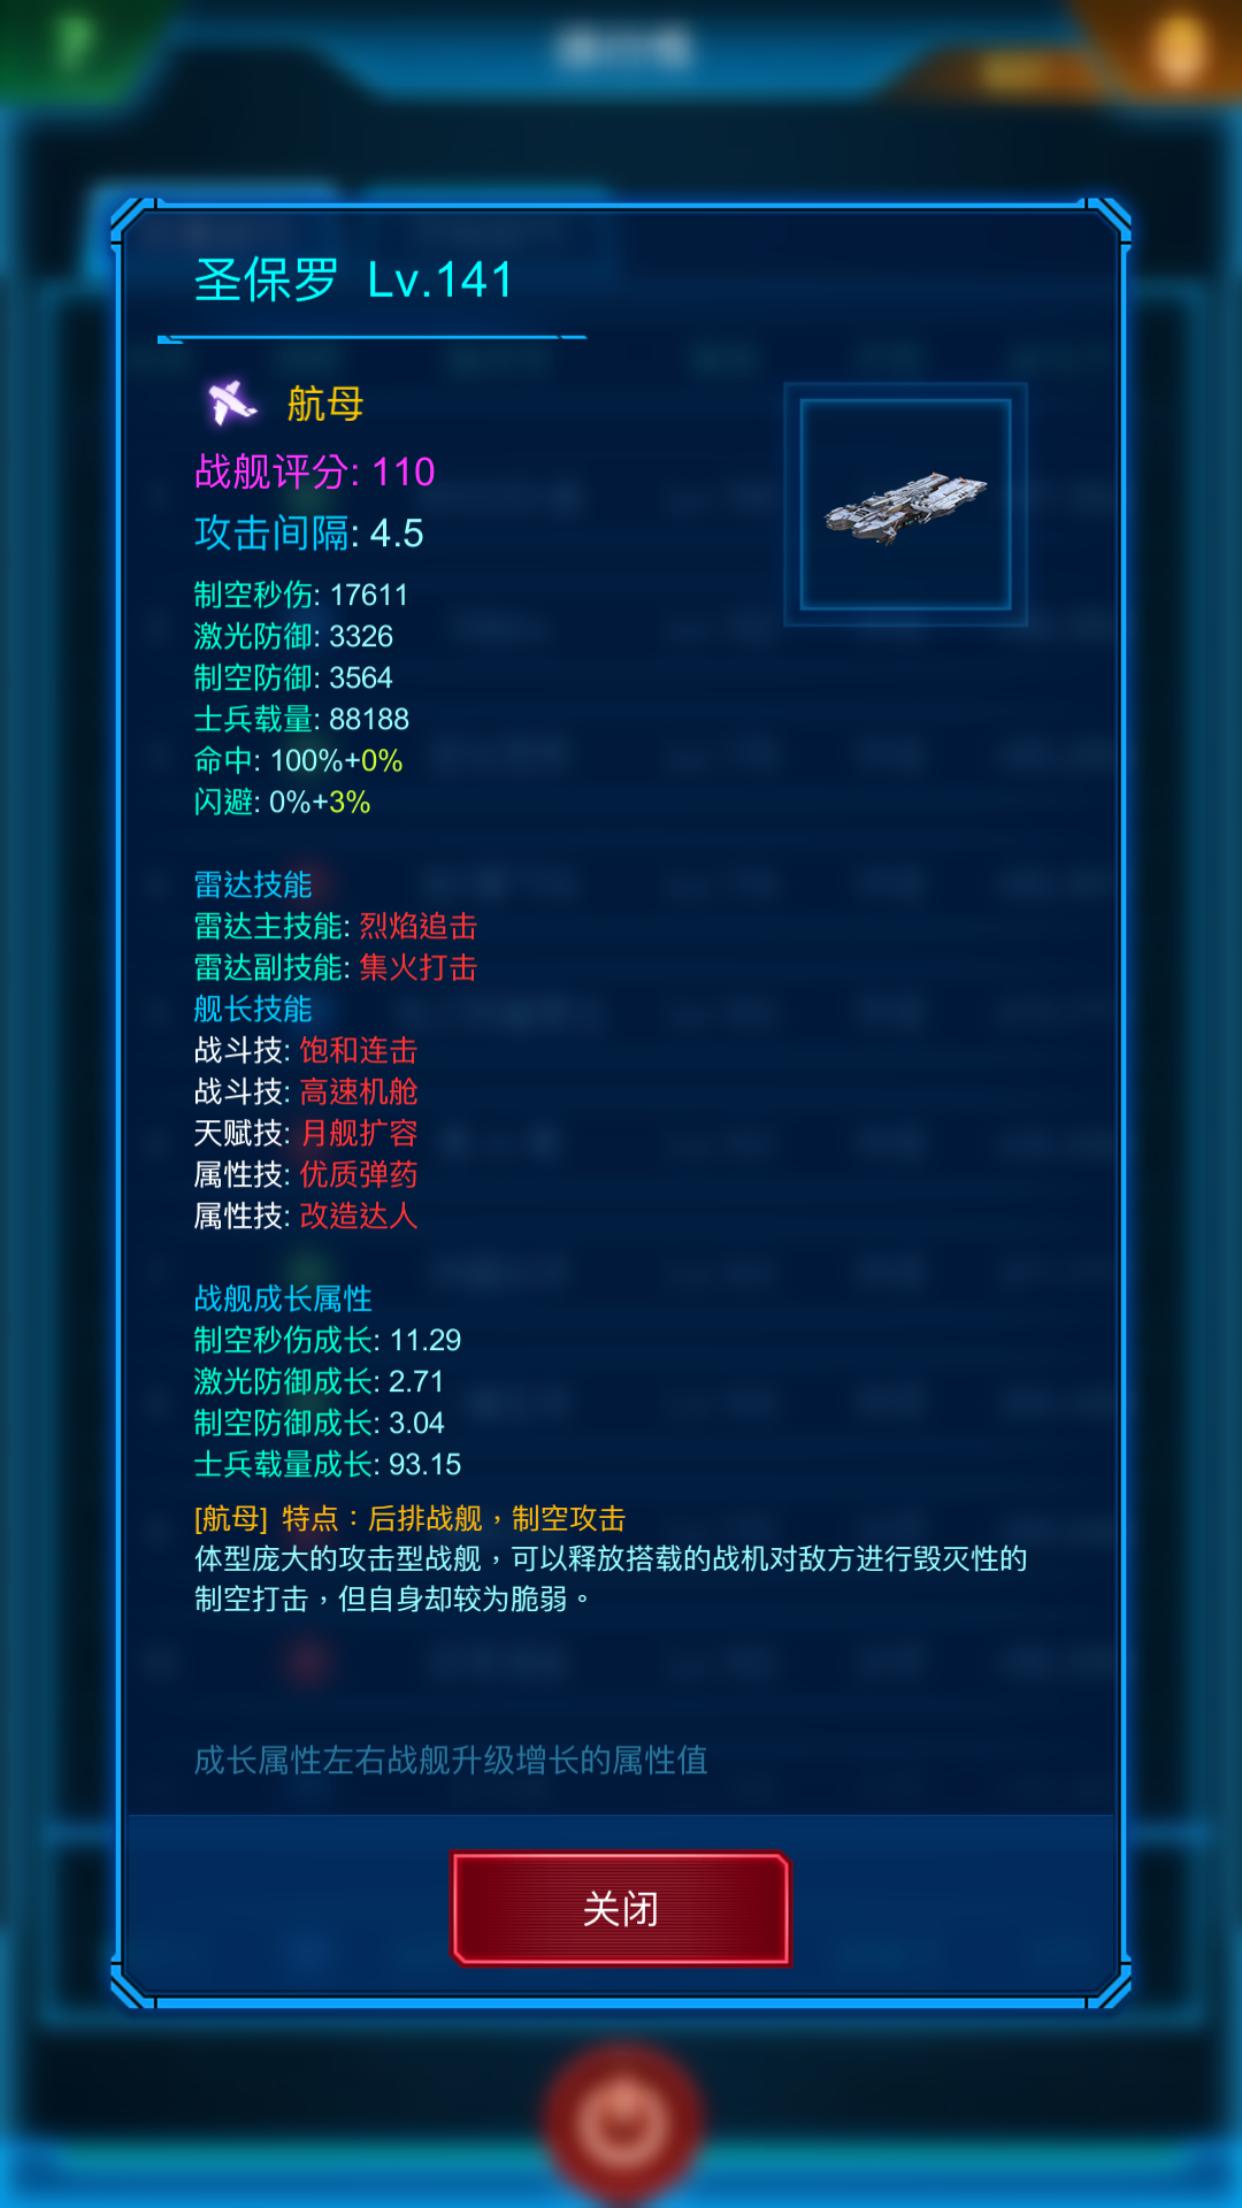 B66C2D5E-29ED-4308-BE95-EACDDB5B17A7.png